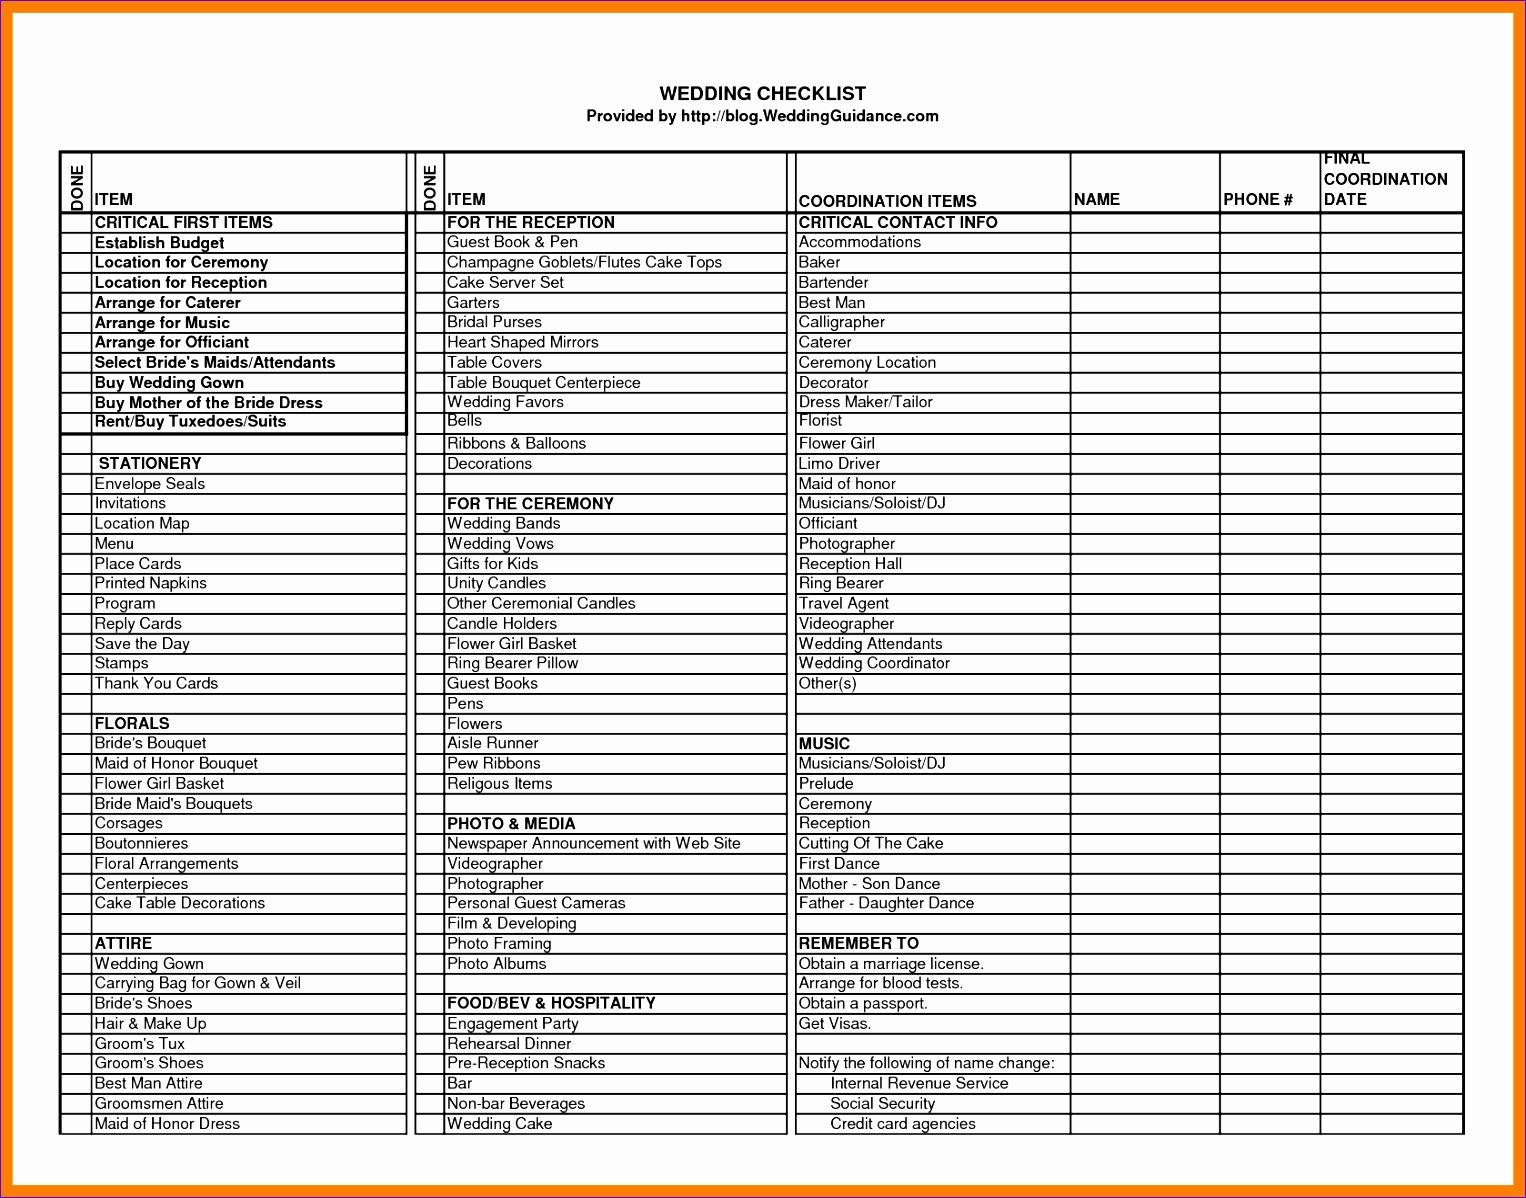 event planning checklist excel a19b28e4c6c78acf0af9a3cfb78dabca